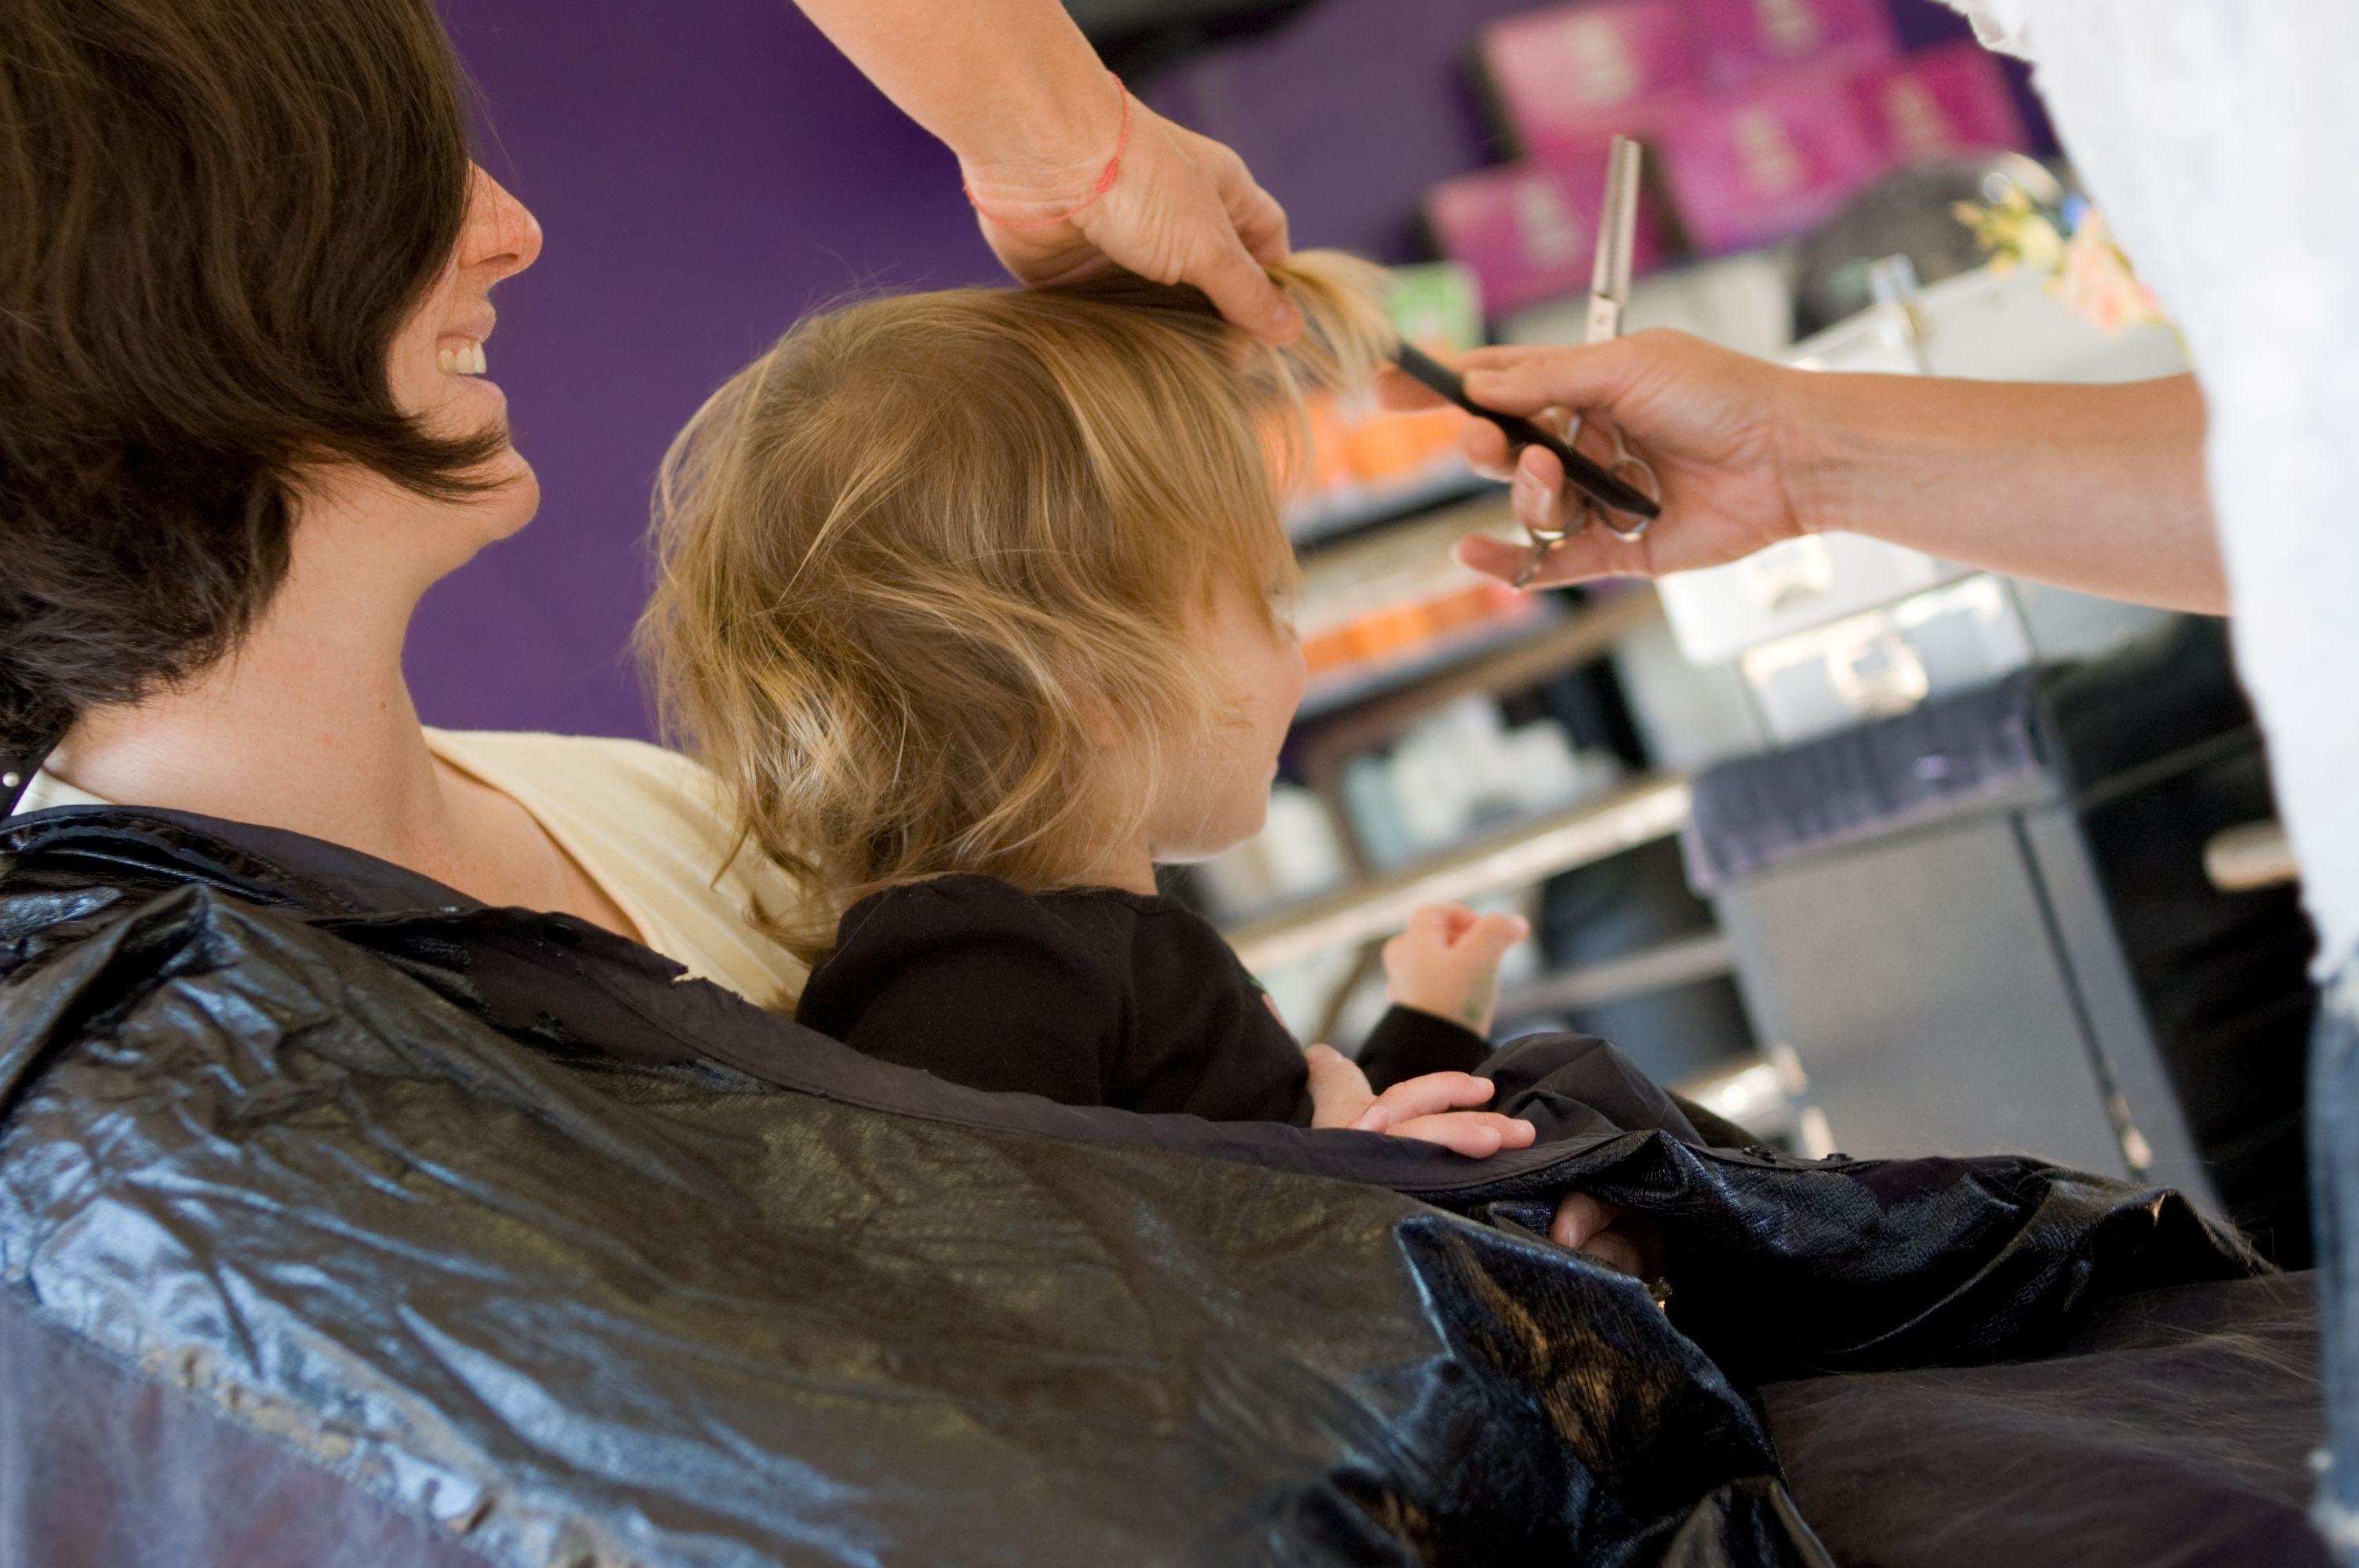 Corte pelo niño: Servicios de Estrada Peluquero Ibiza